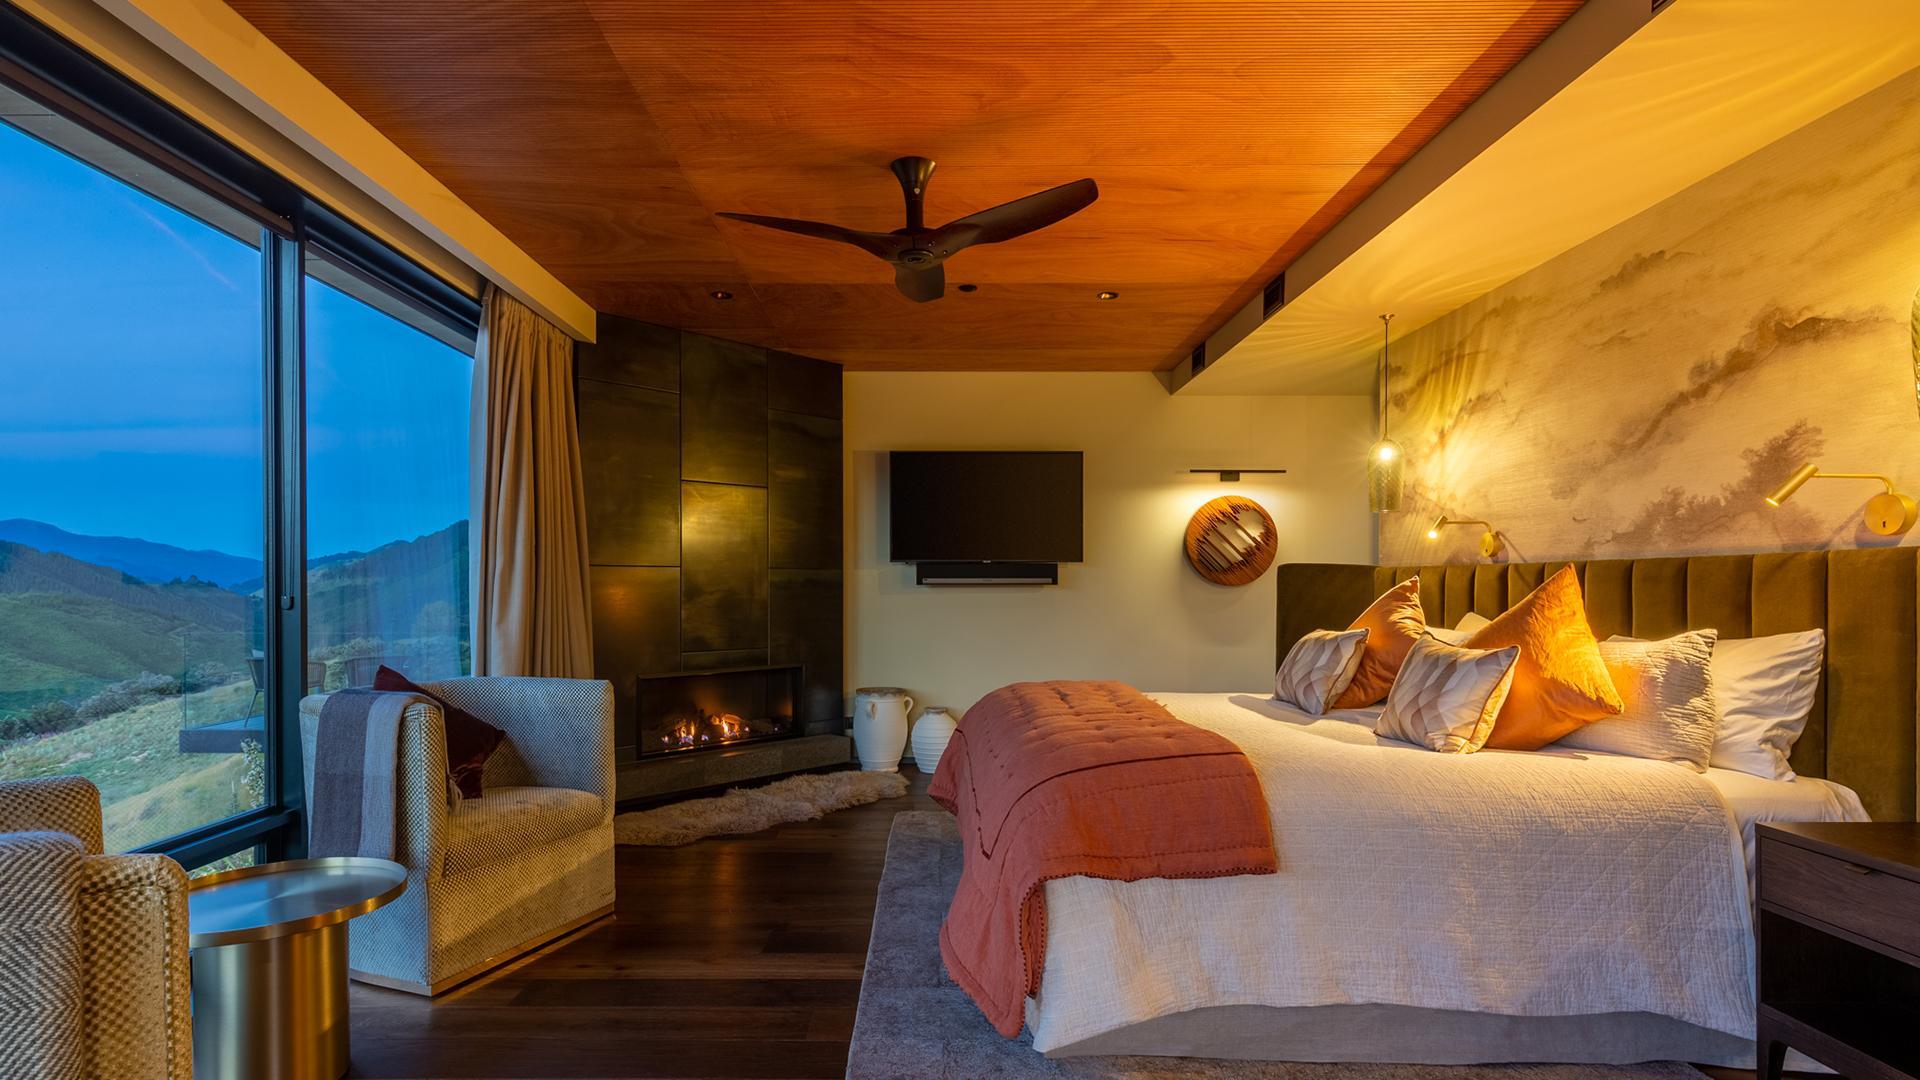 Motueka Suite image 1 at Falcon Brae Villa by null, Tasman, New Zealand